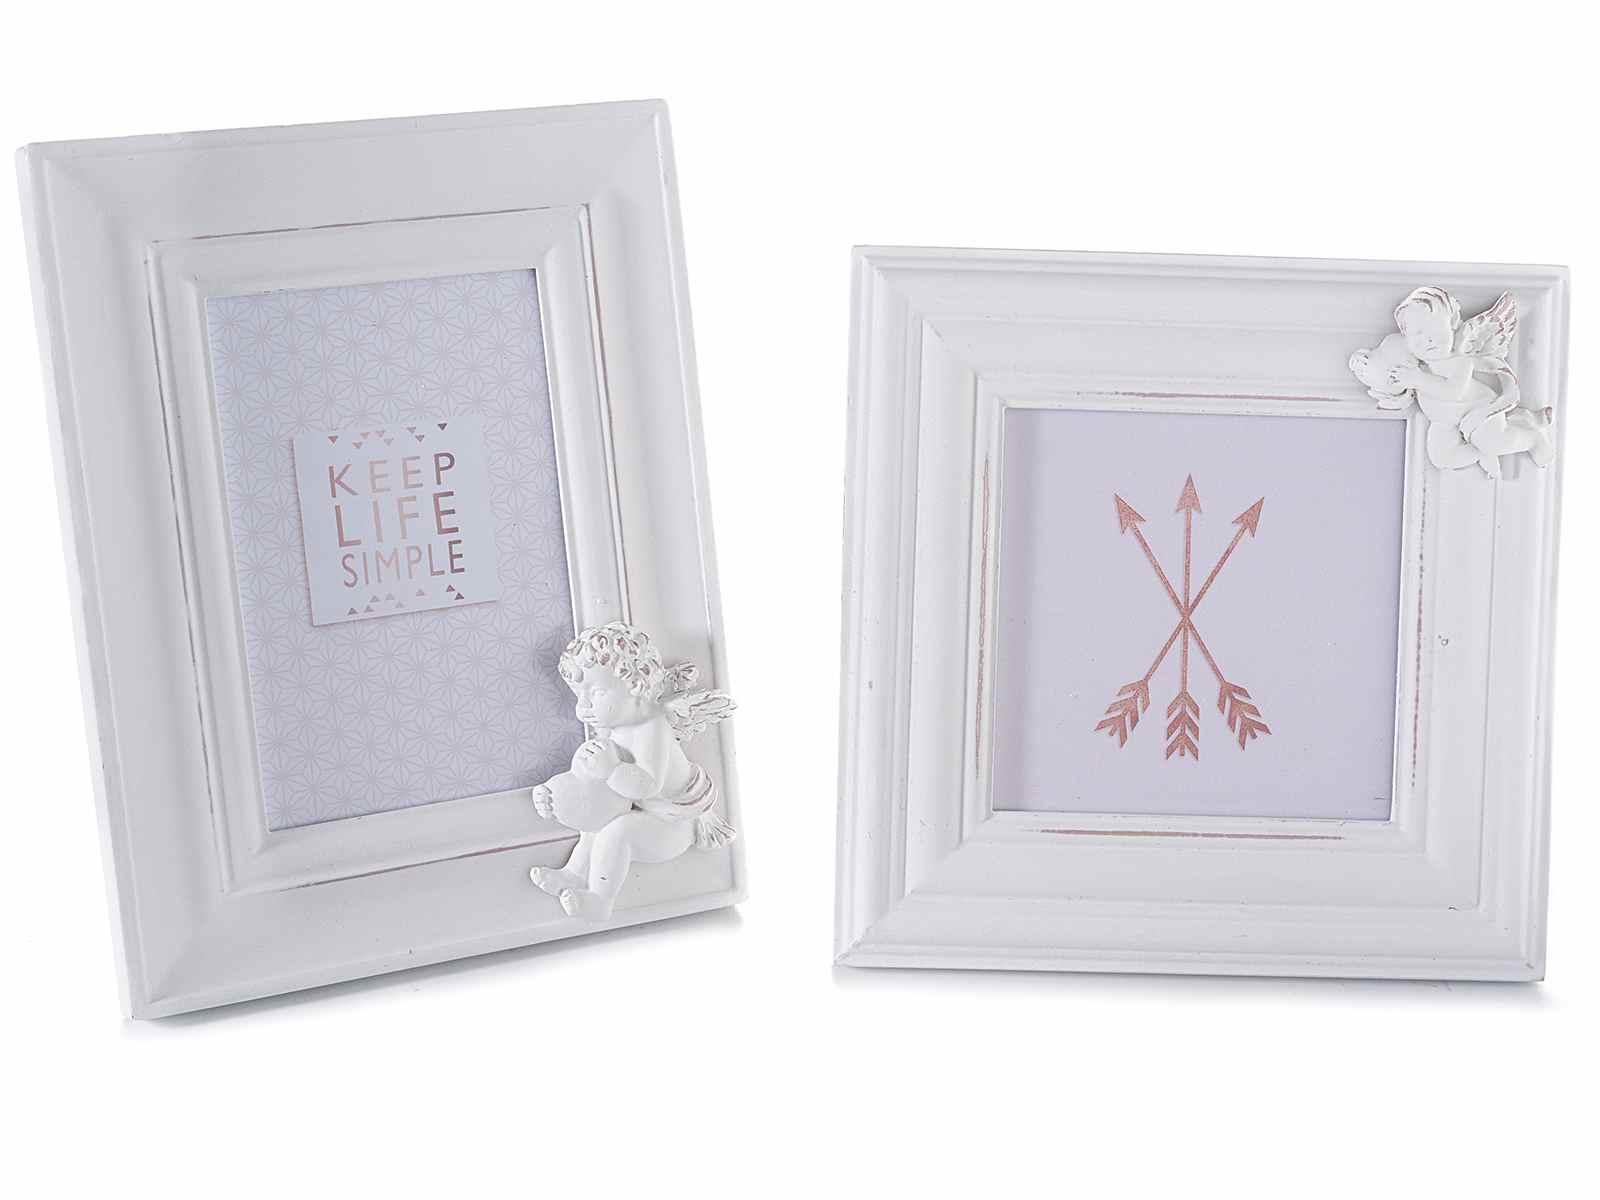 Set de 2 marcos de fotos blancos de madera (51.30.36) - Art From Italy